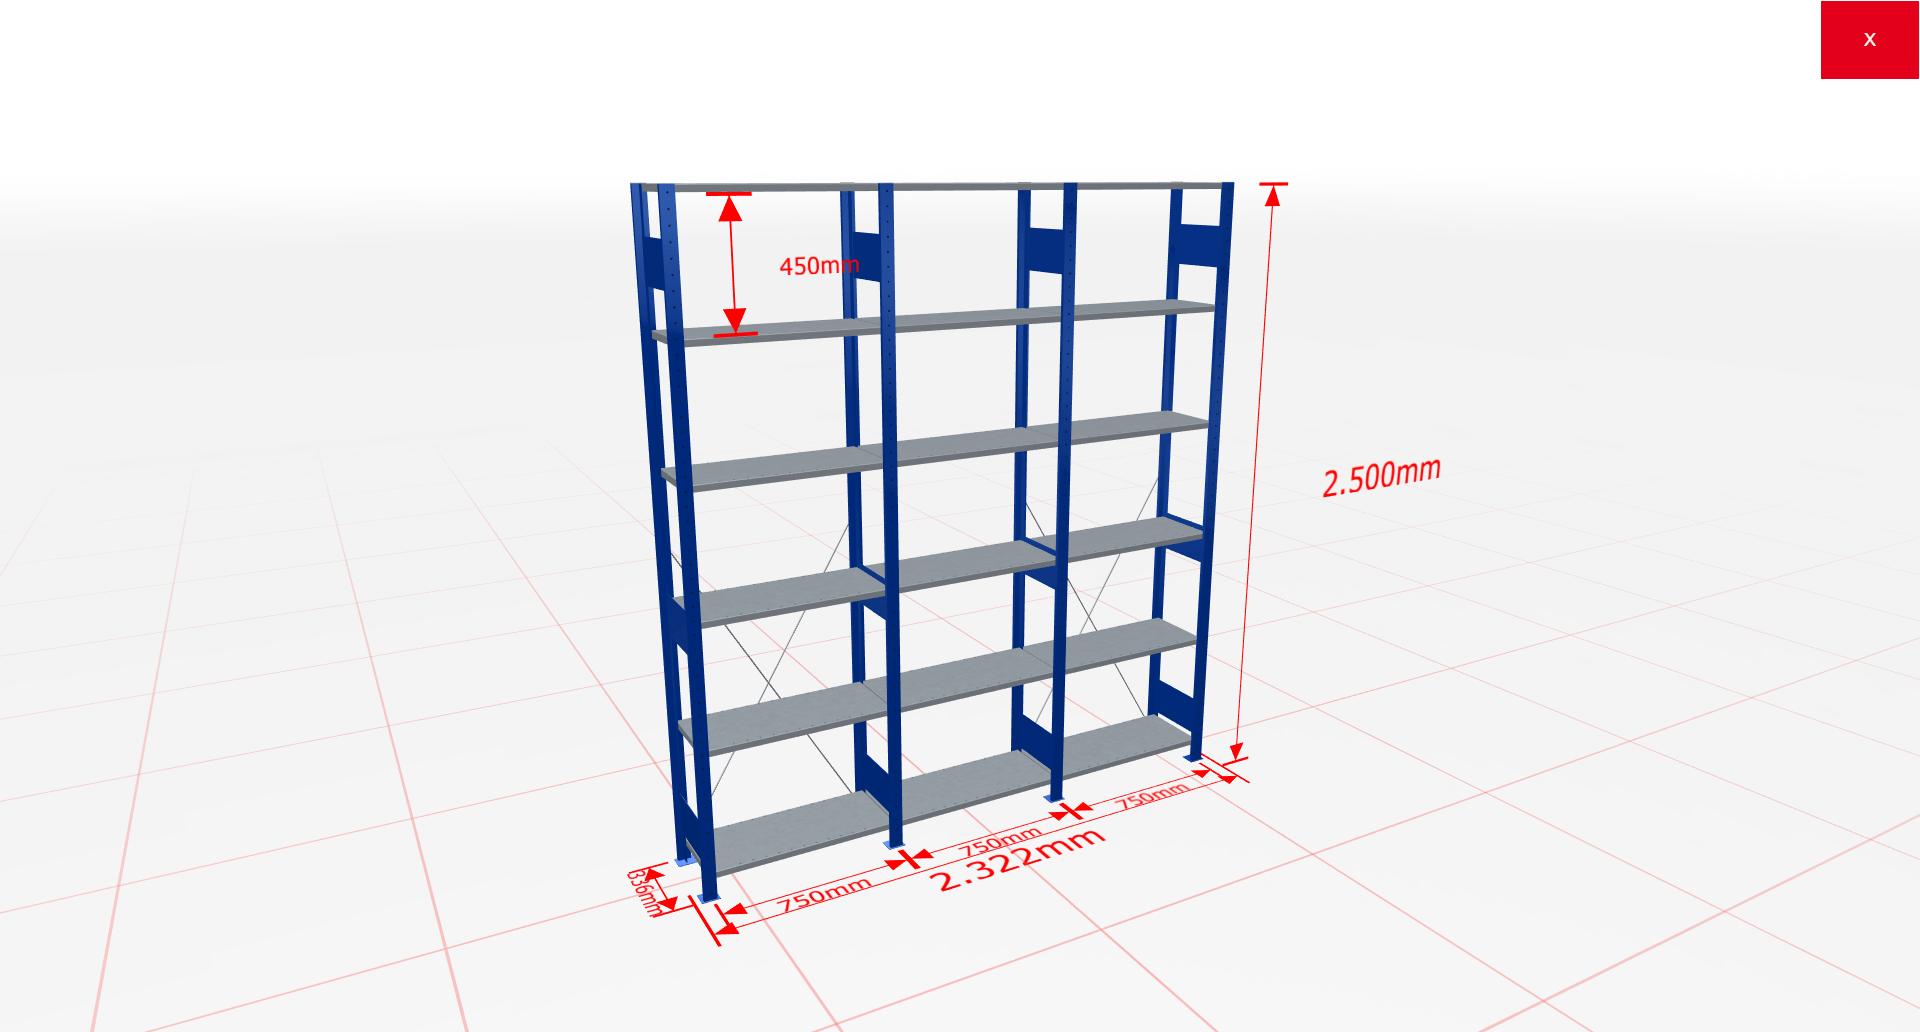 Fachbodenregal Komplettregal 2500x2322x300 mm (HxBxT) SCHULTE Lagertechnik blau 6 Ebenen  150 kg je Boden